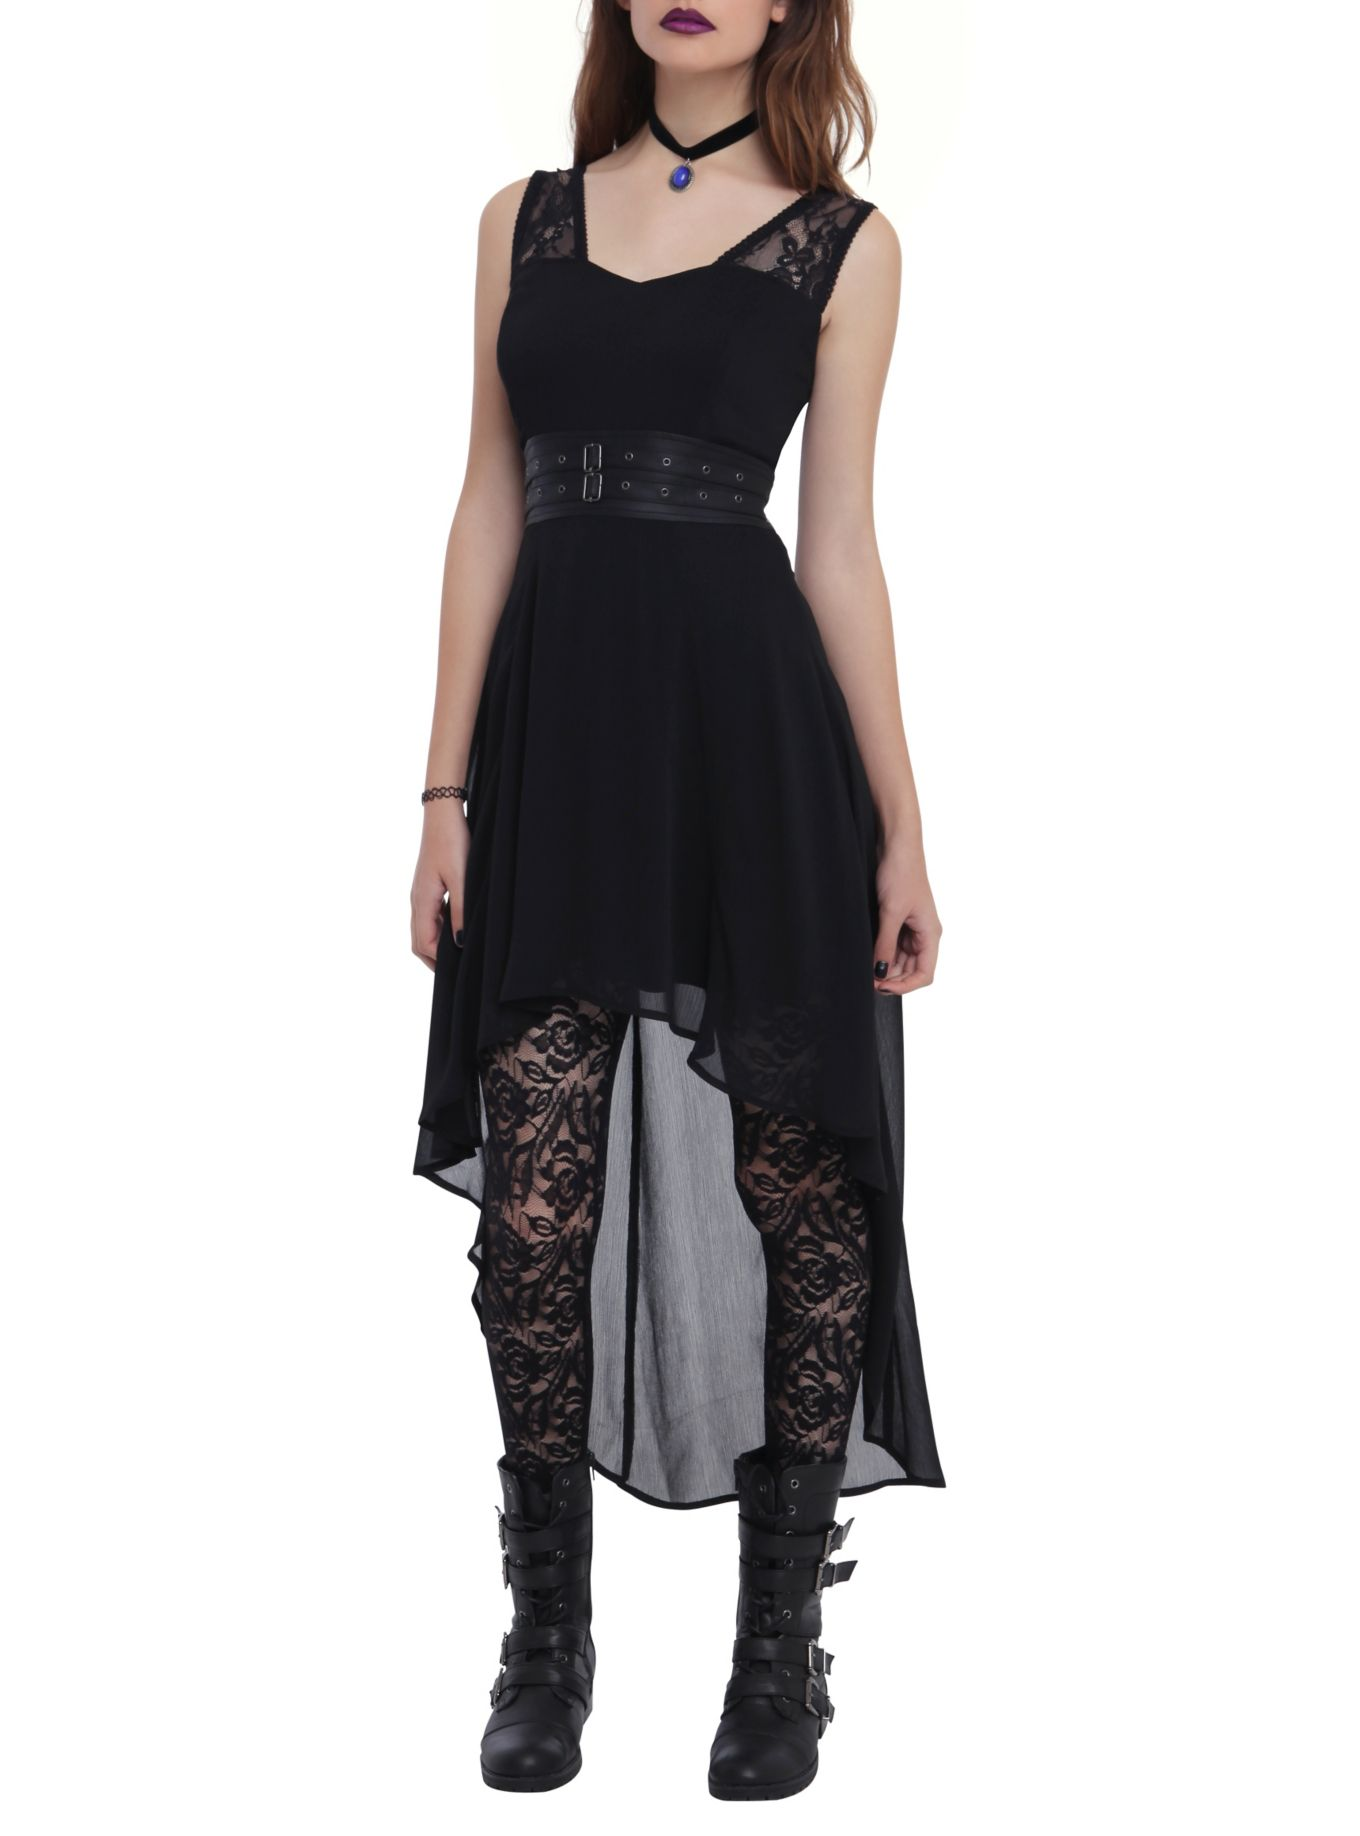 Royal Bones By Tripp Black Chiffon Hi-Lo Dress  d120e165e